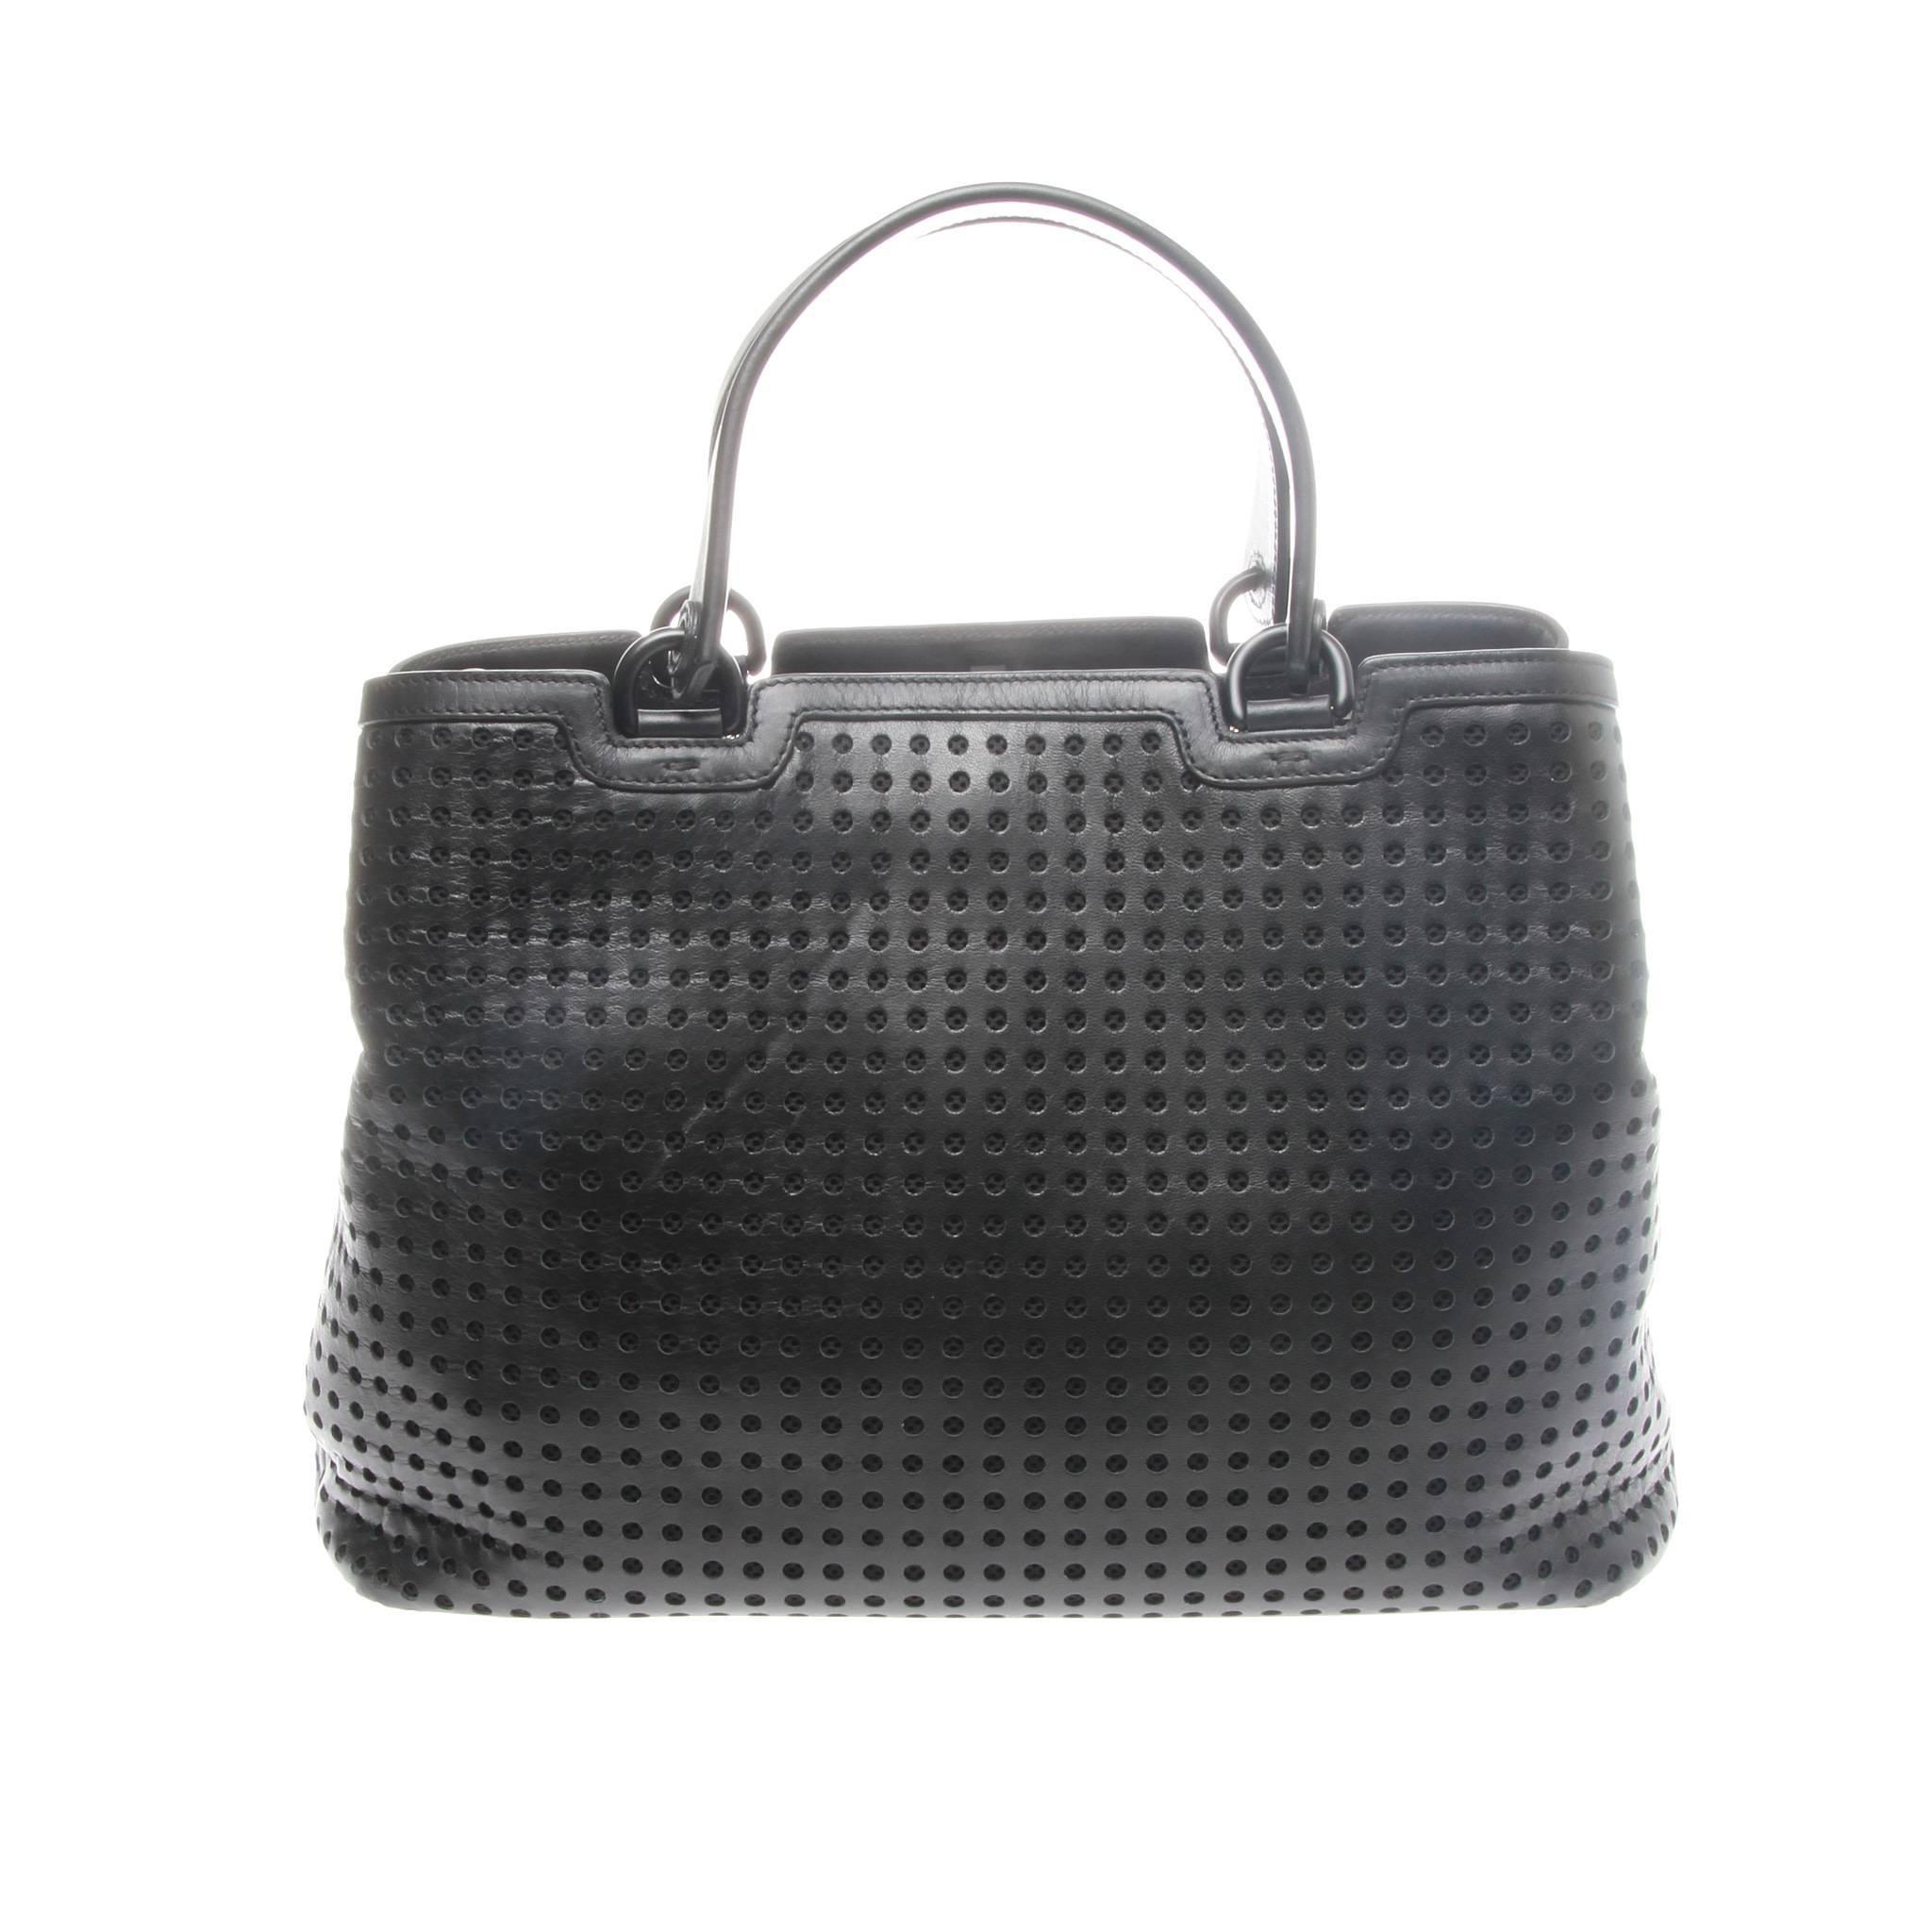 1stdibs Emporio Armani Perforated Shopper 4OnwNbf0T